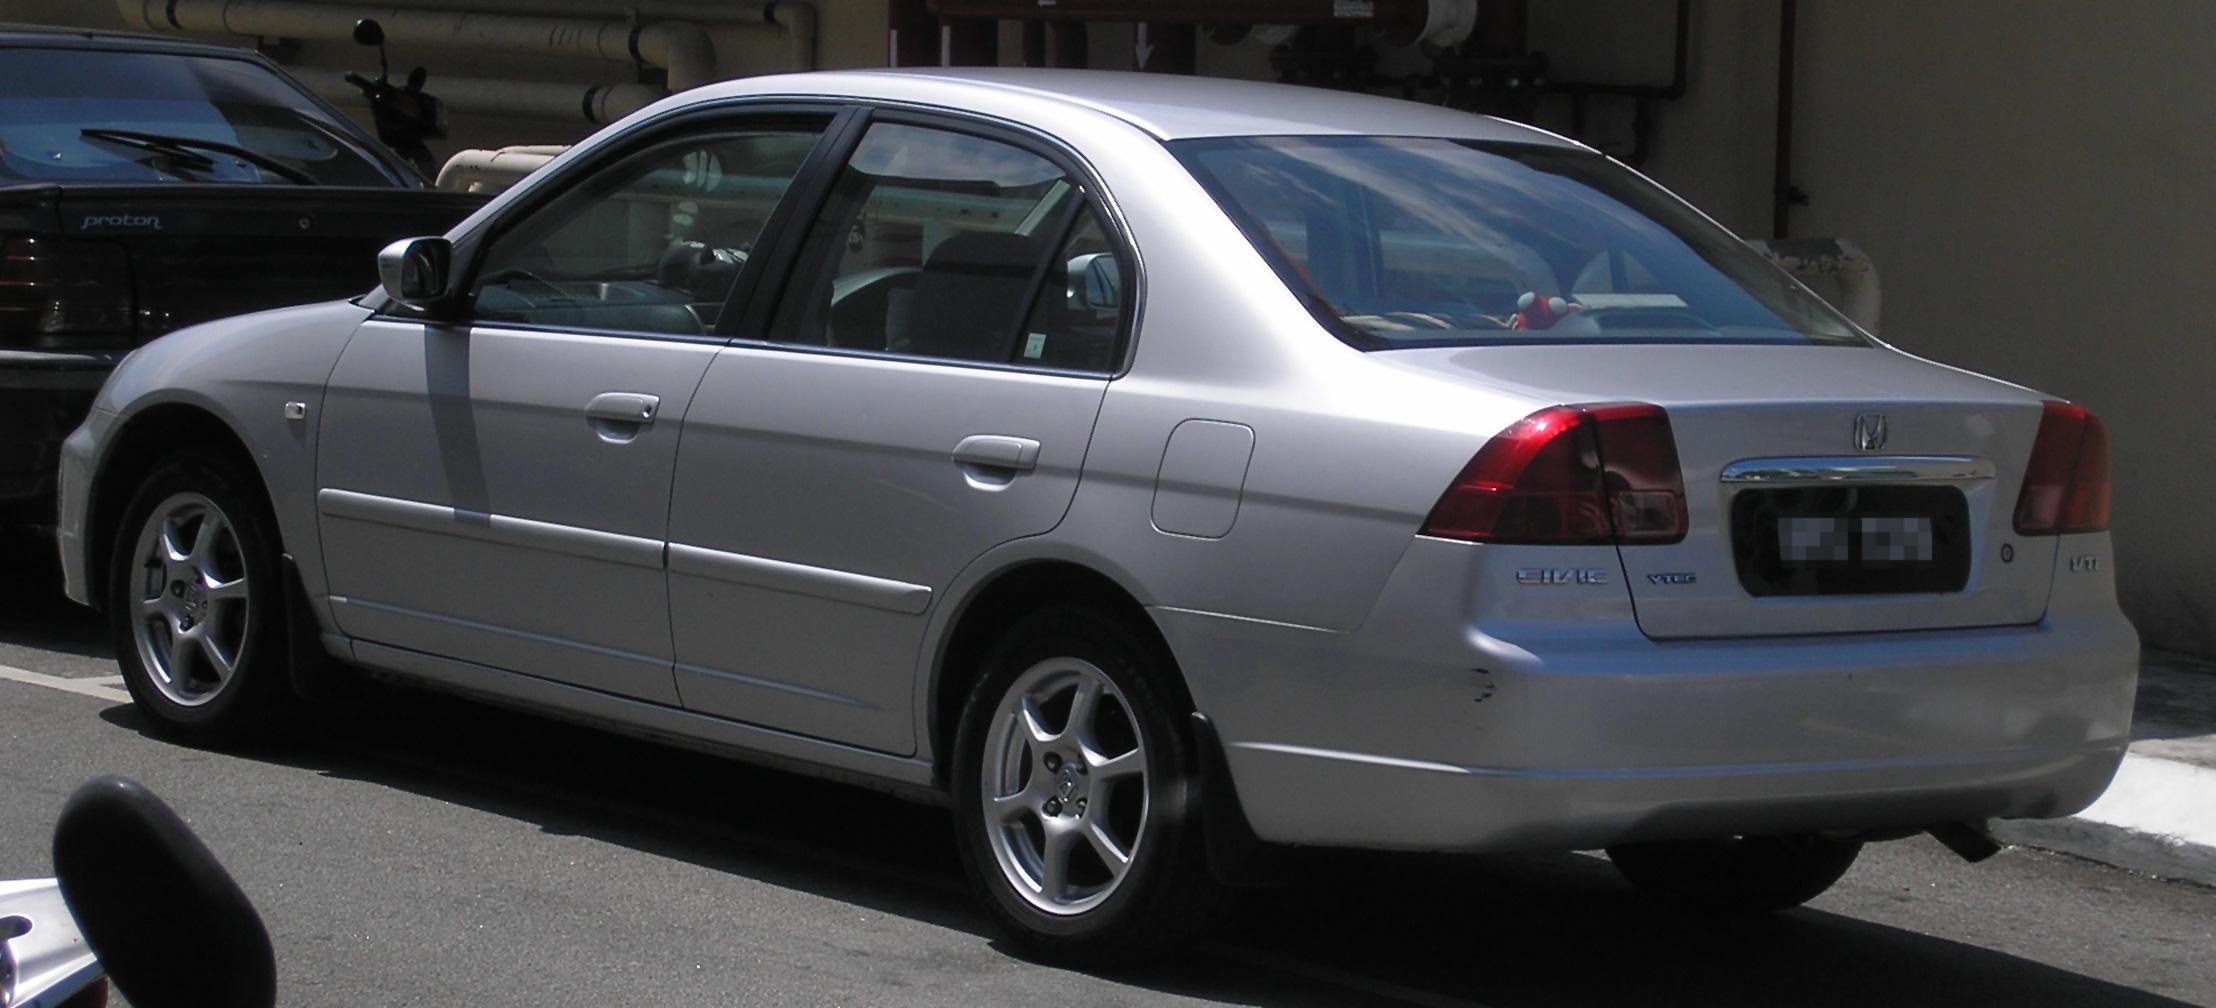 Honda Civic 2004 Exterior Rear Side View